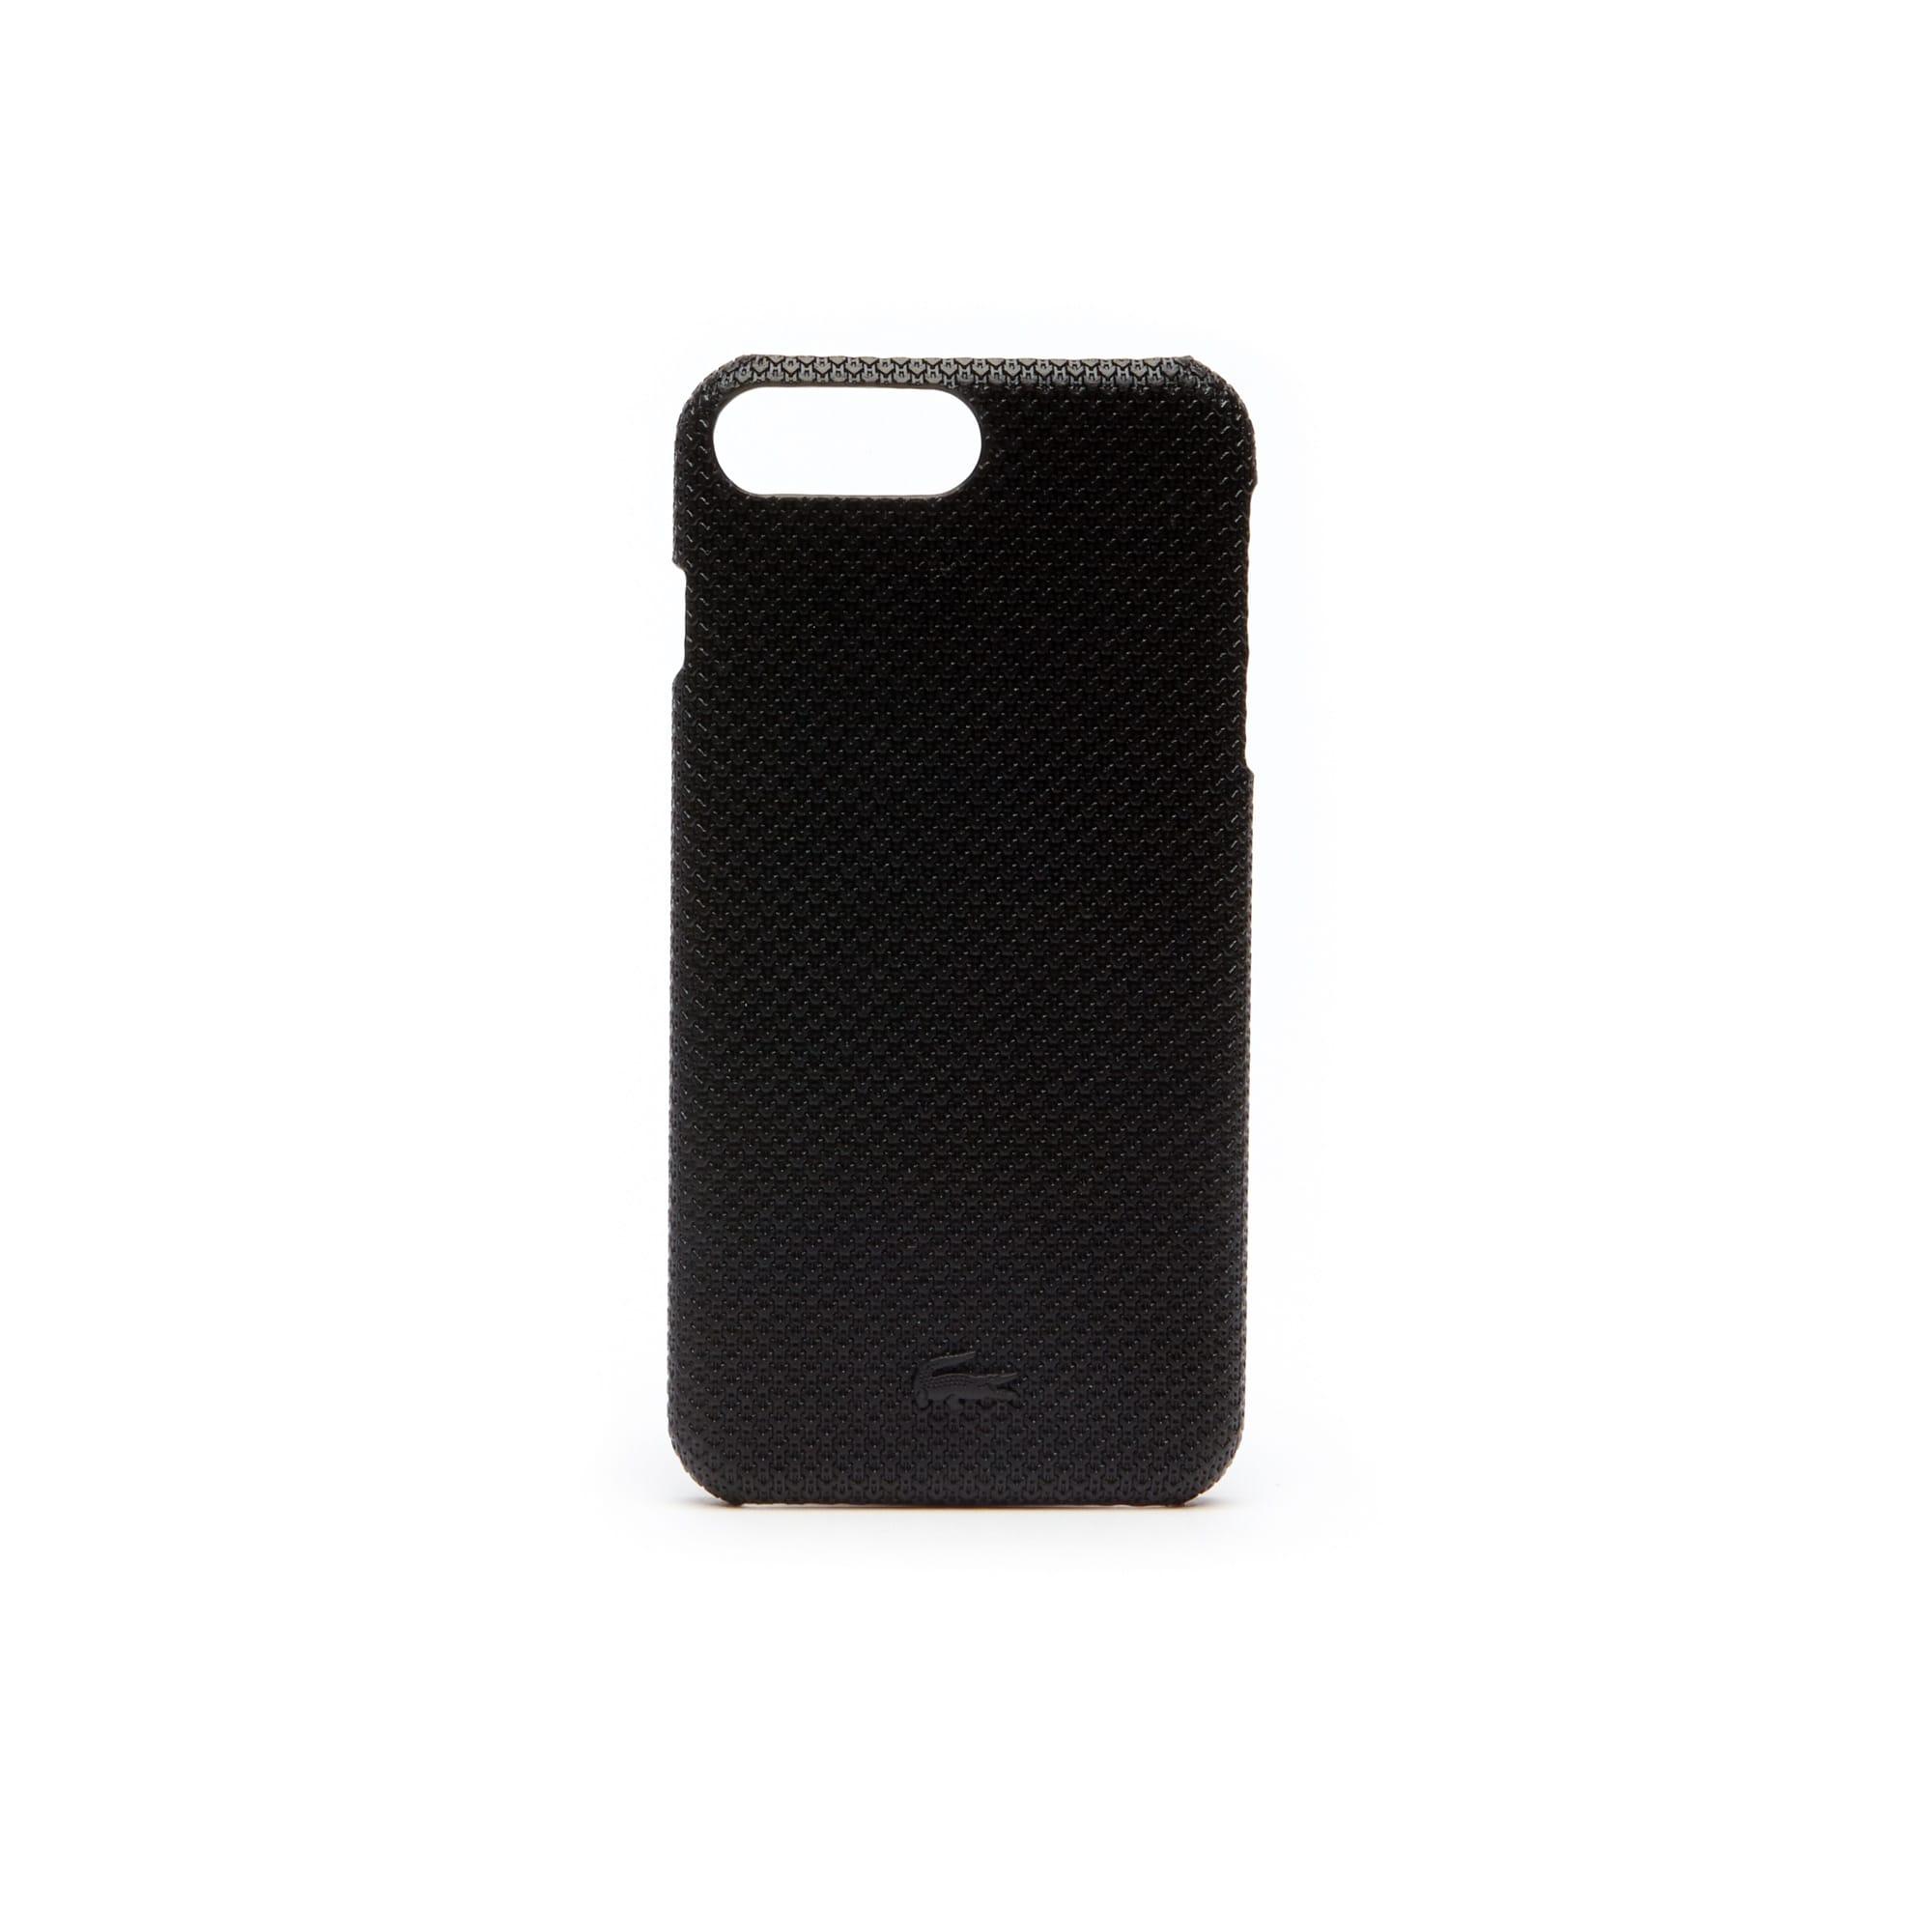 Coque iPhone 8+ Chantaco en cuir piqué mat uni